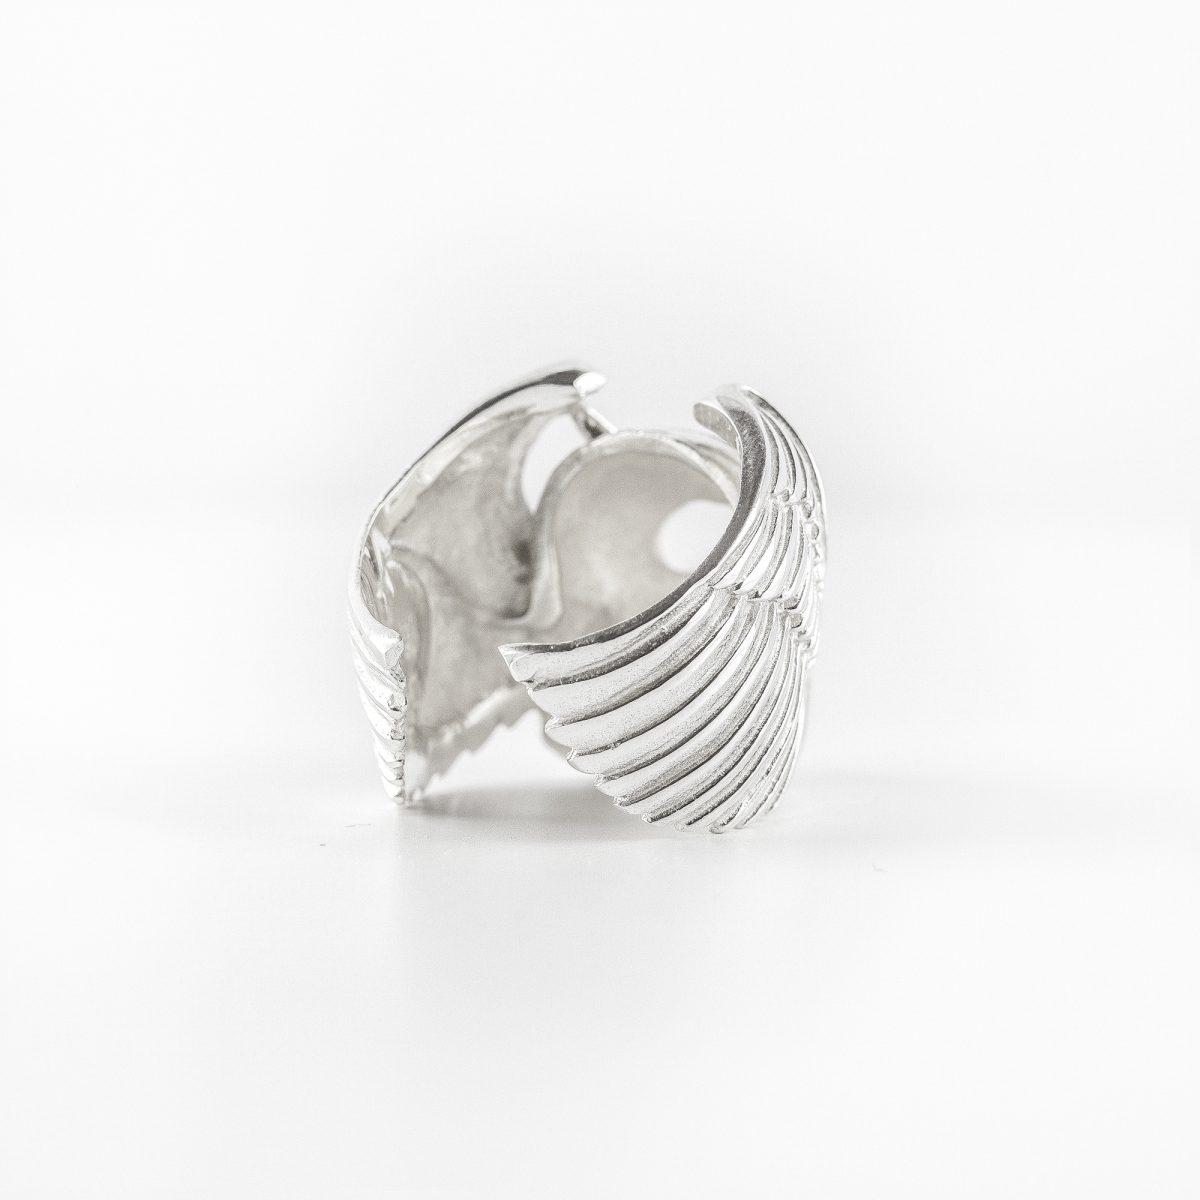 Chevalière homme tête de mort en argent massif (925) Perle de Jade